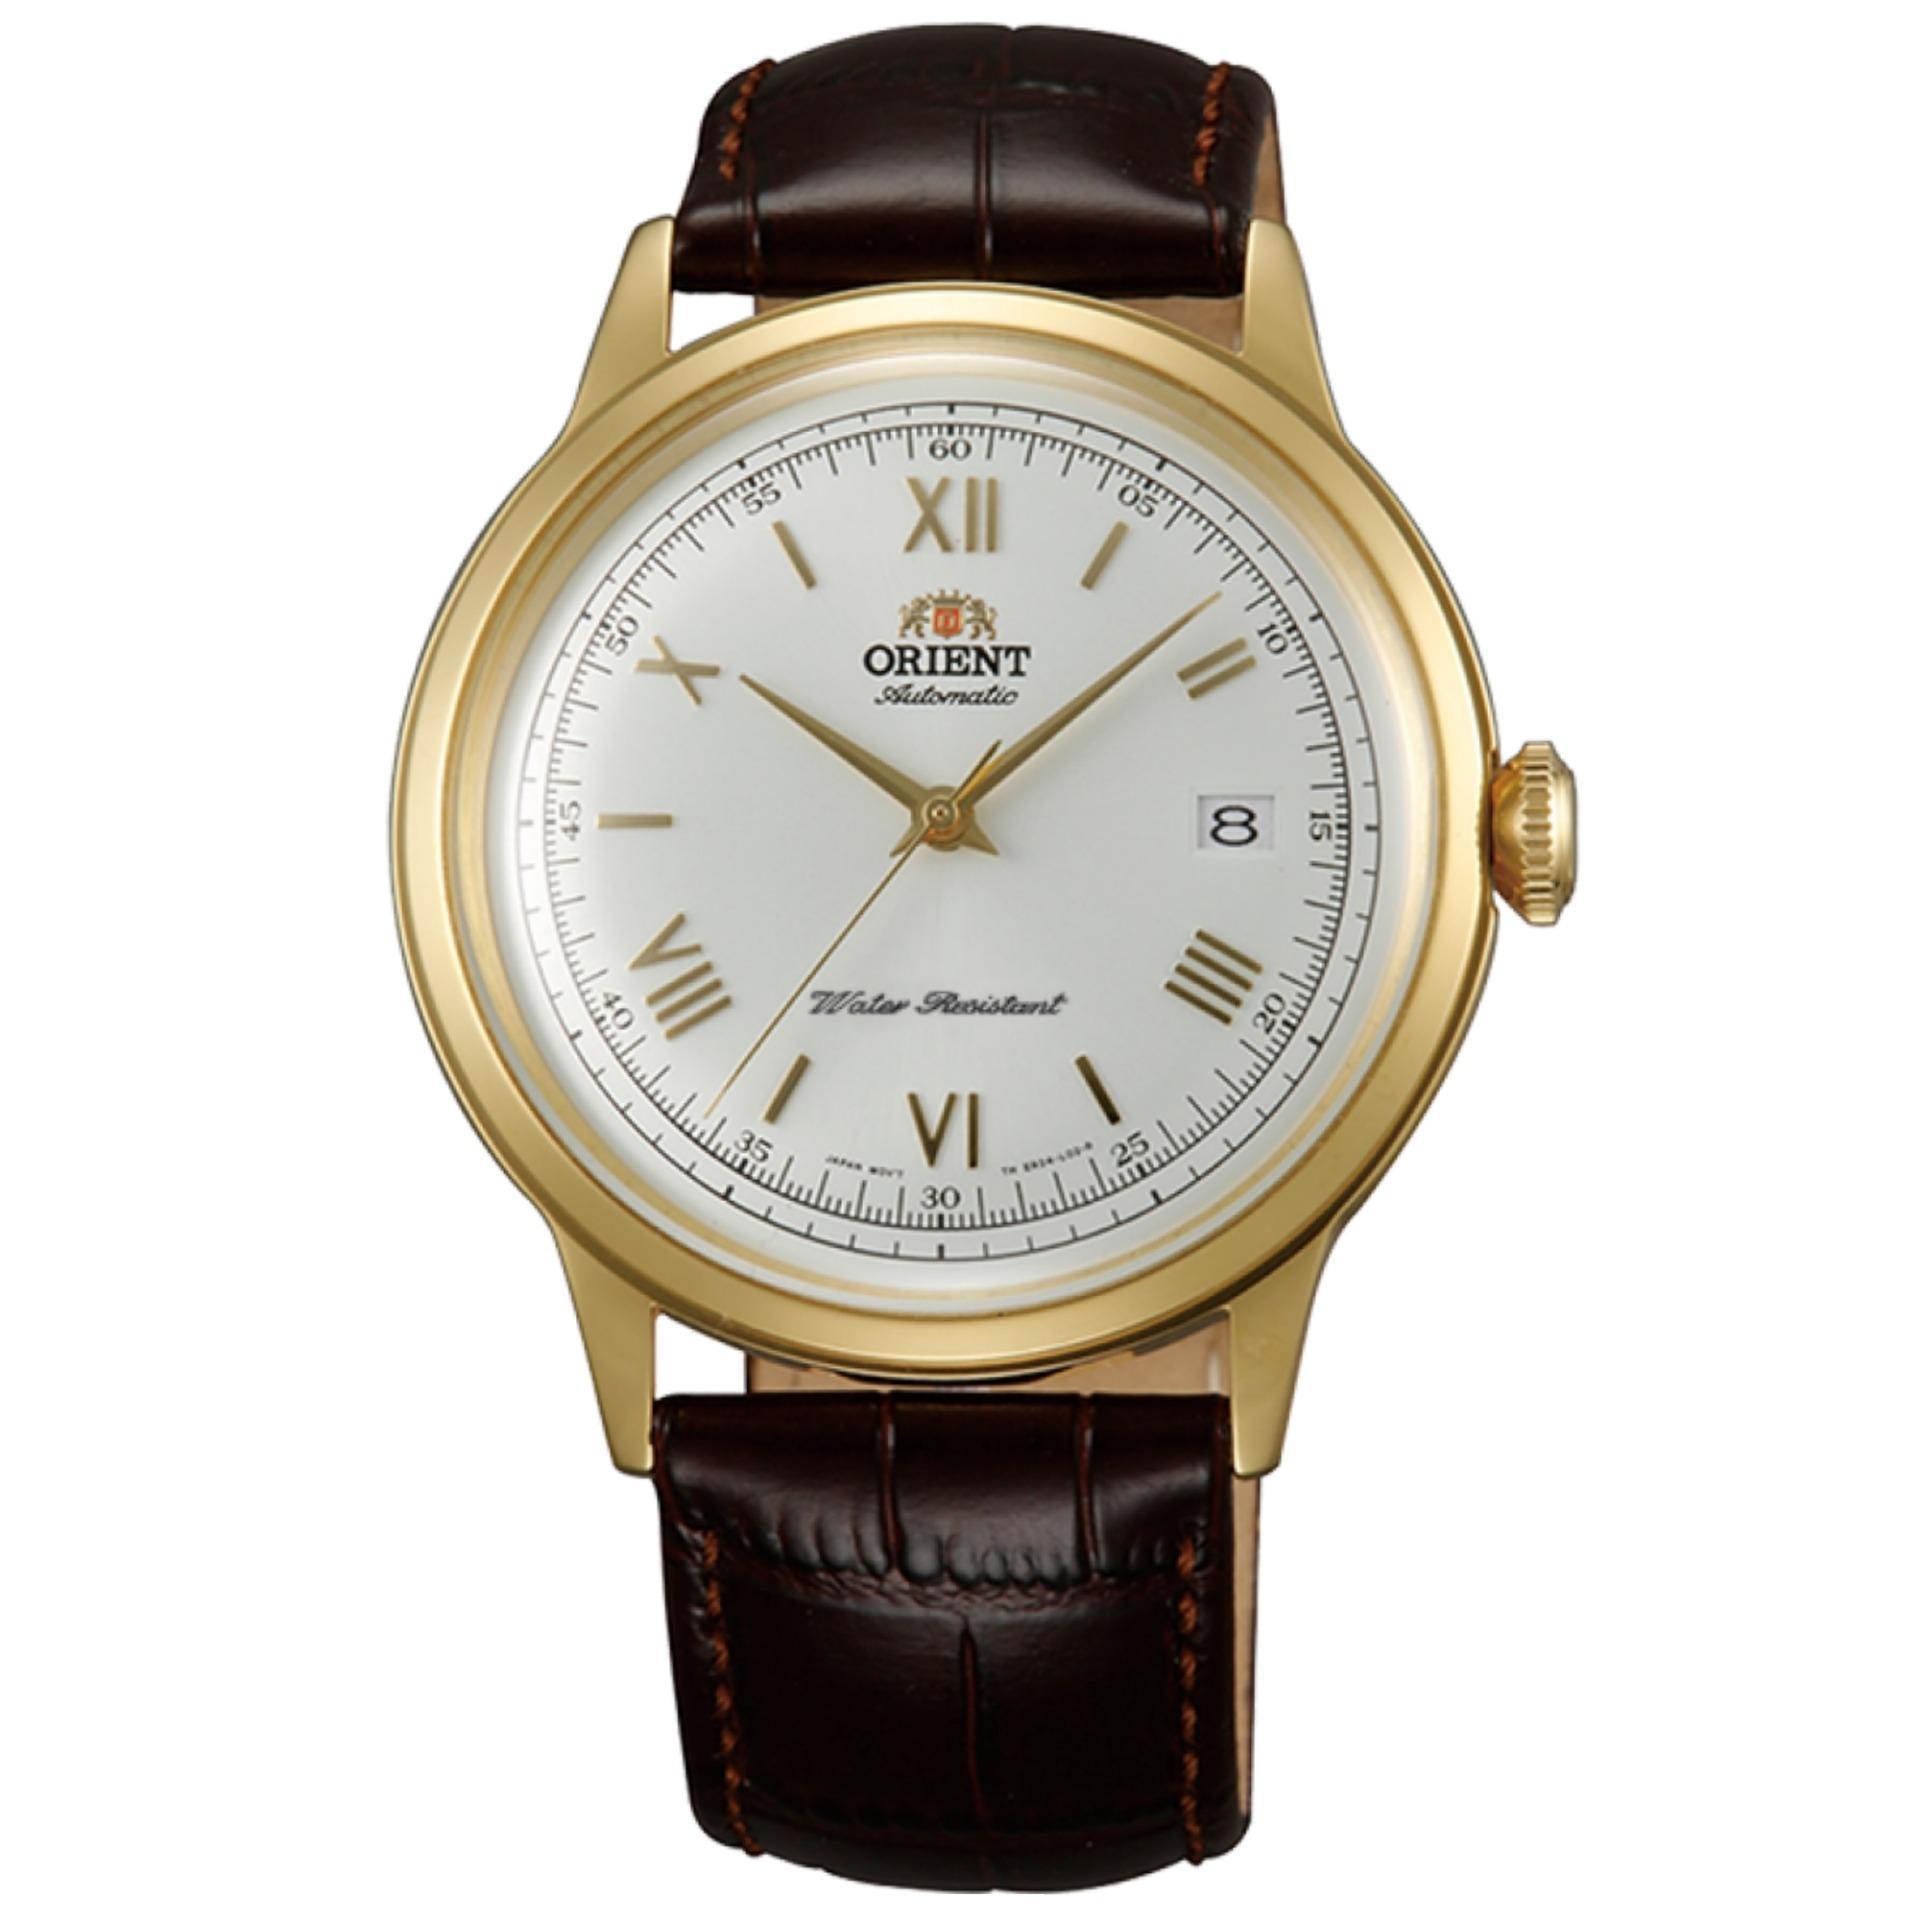 Orient Bambino Automatic Watch (AC00007W)